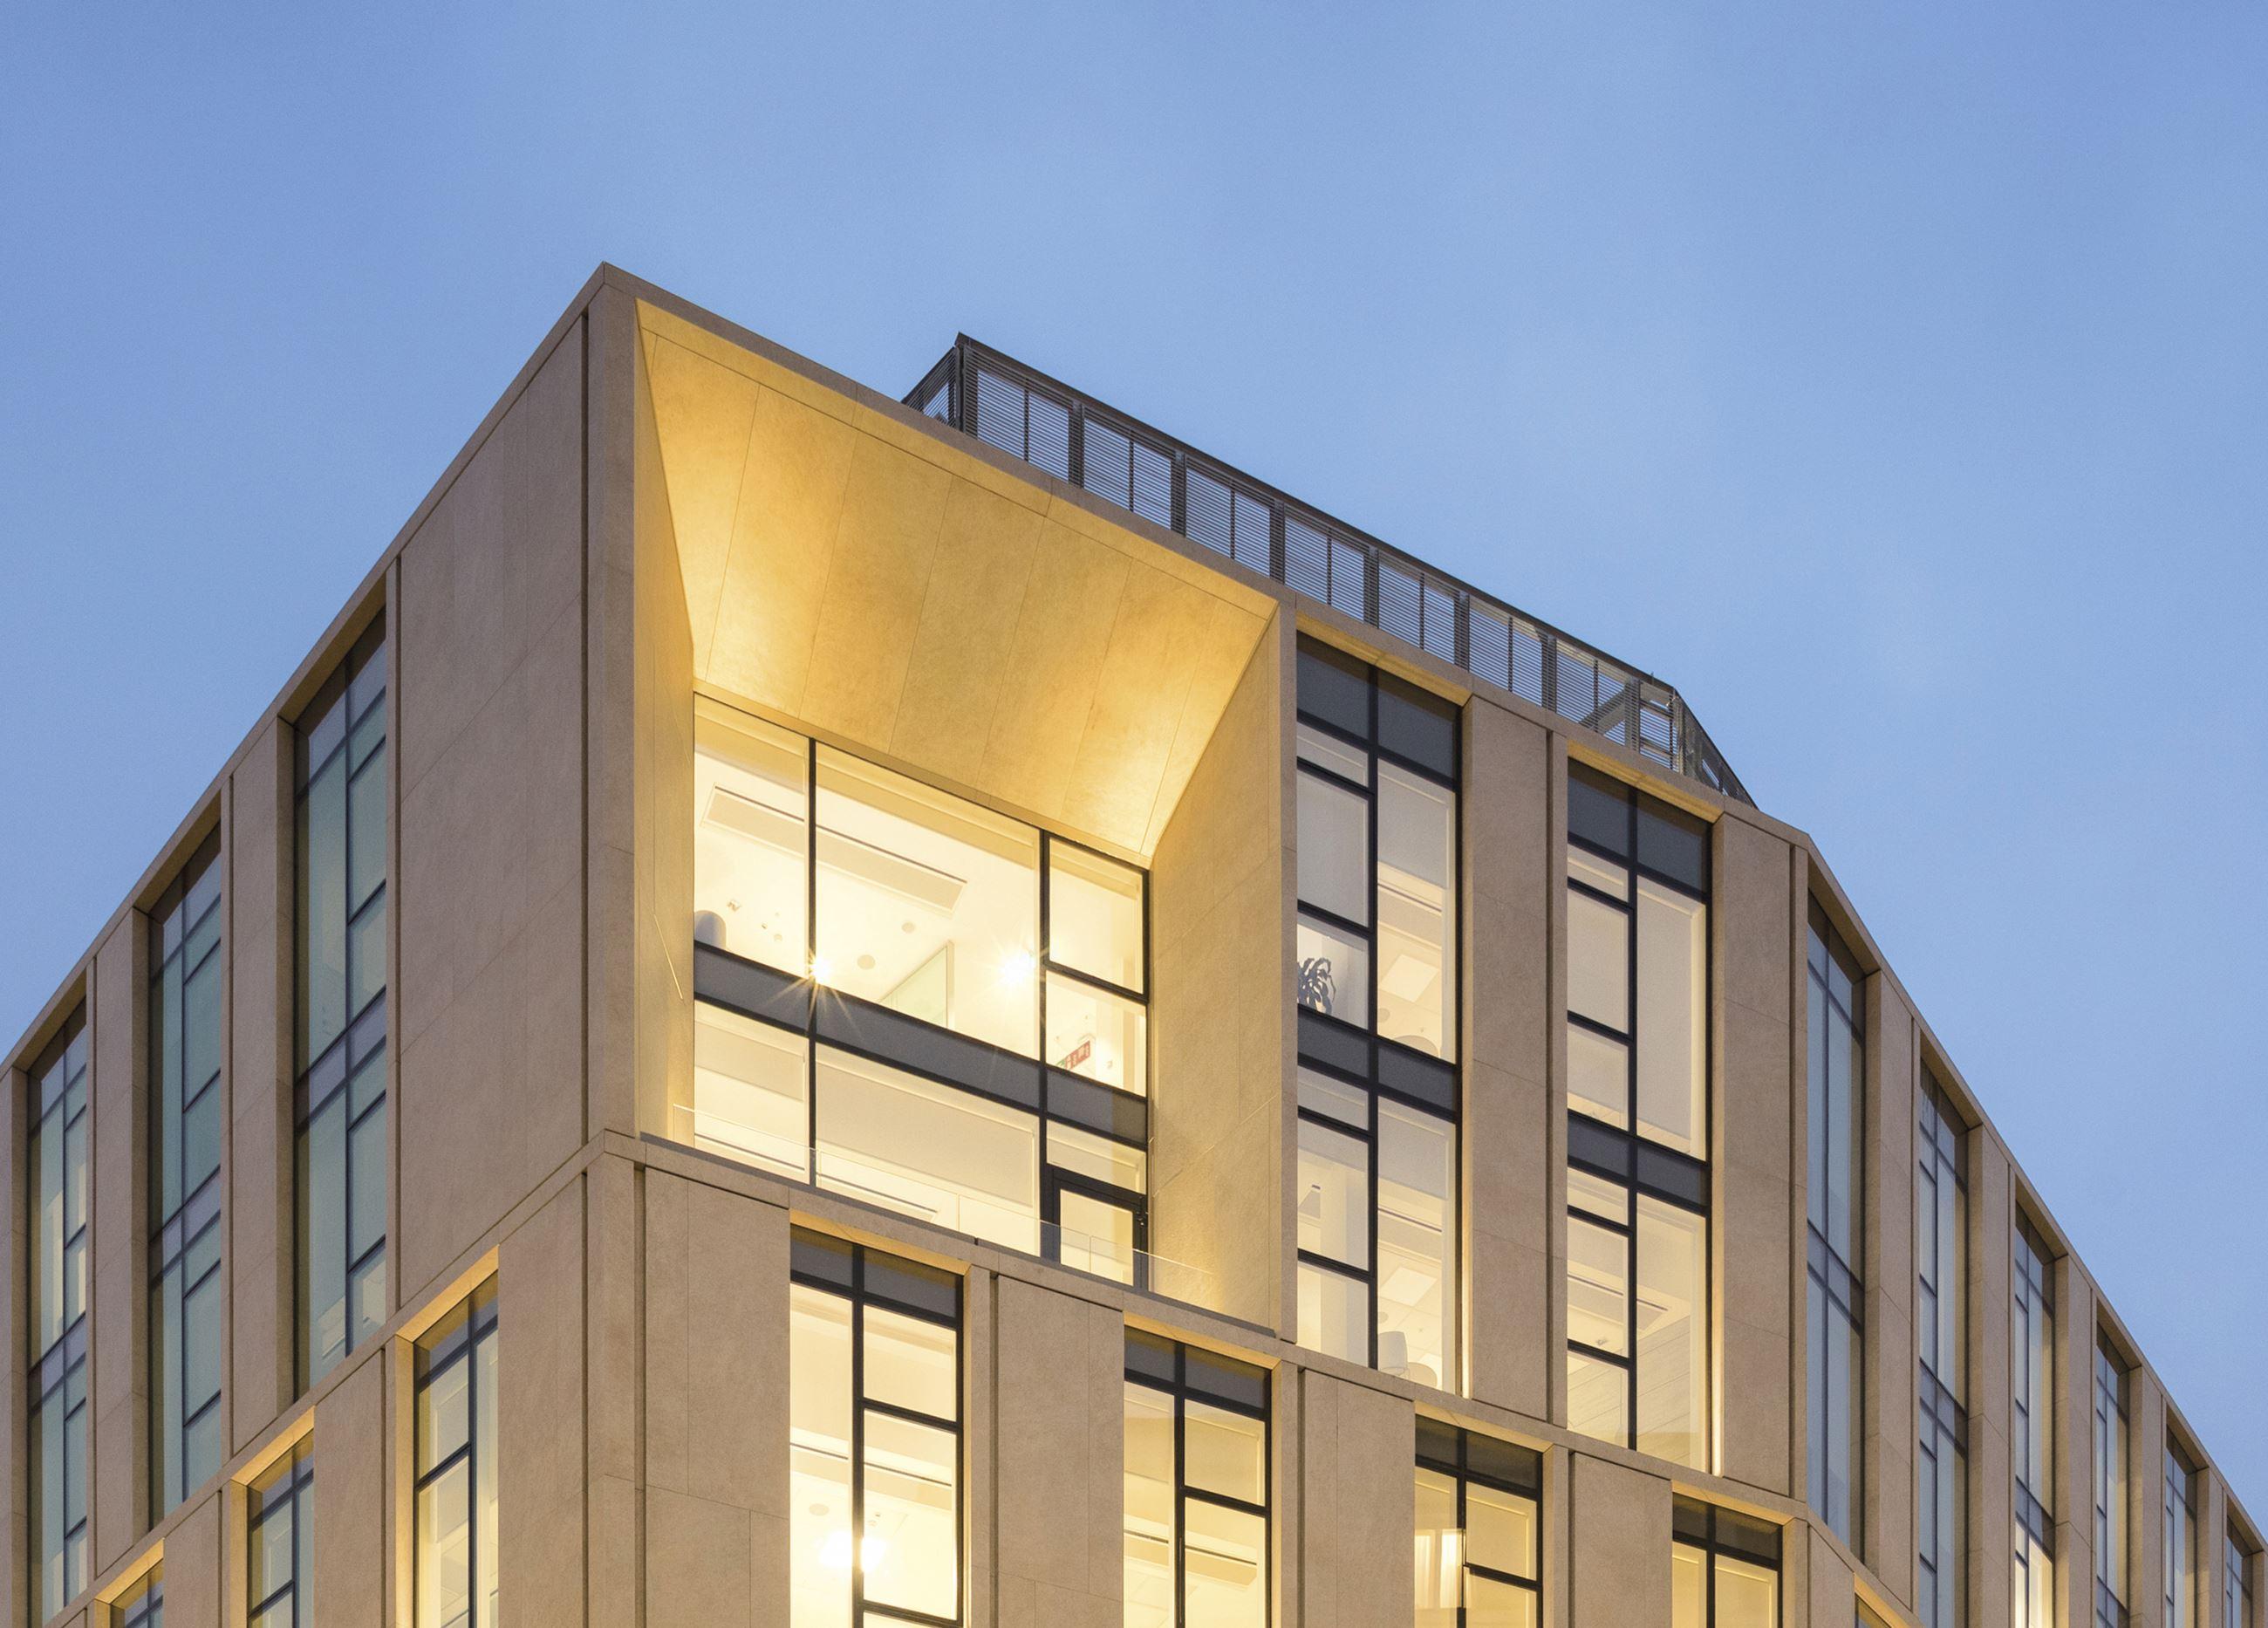 Architectural elements assembling